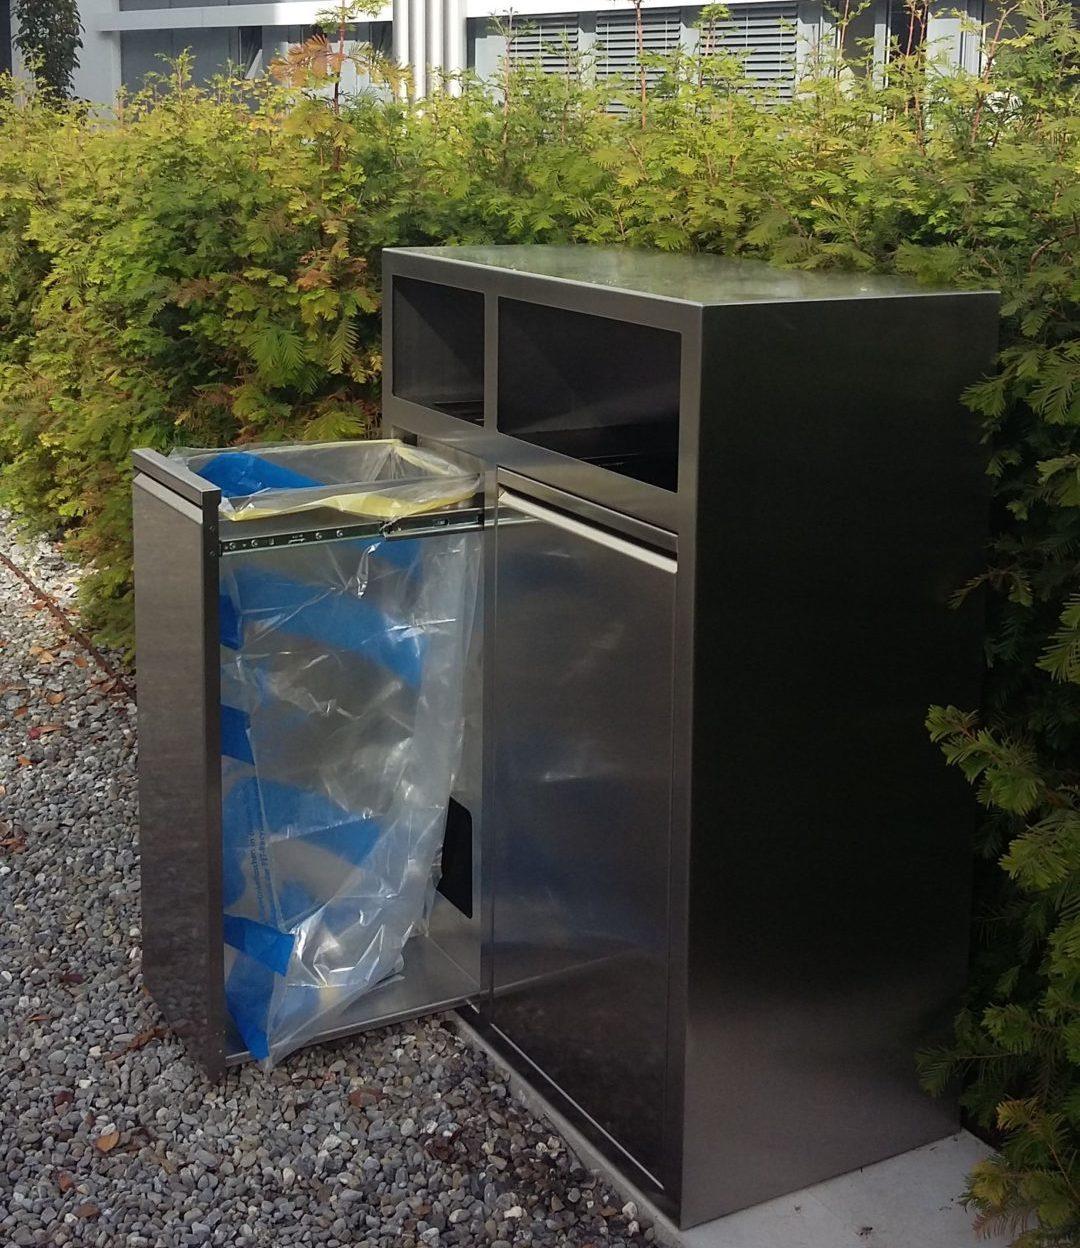 K2, Recyclingstation, Wertstofftrenner, Abfallbehälter, 110 Liter, PET, Abfall, Recycling Station, Public Waste bin, Poubelle Recyclage, Edelstahl, Inox